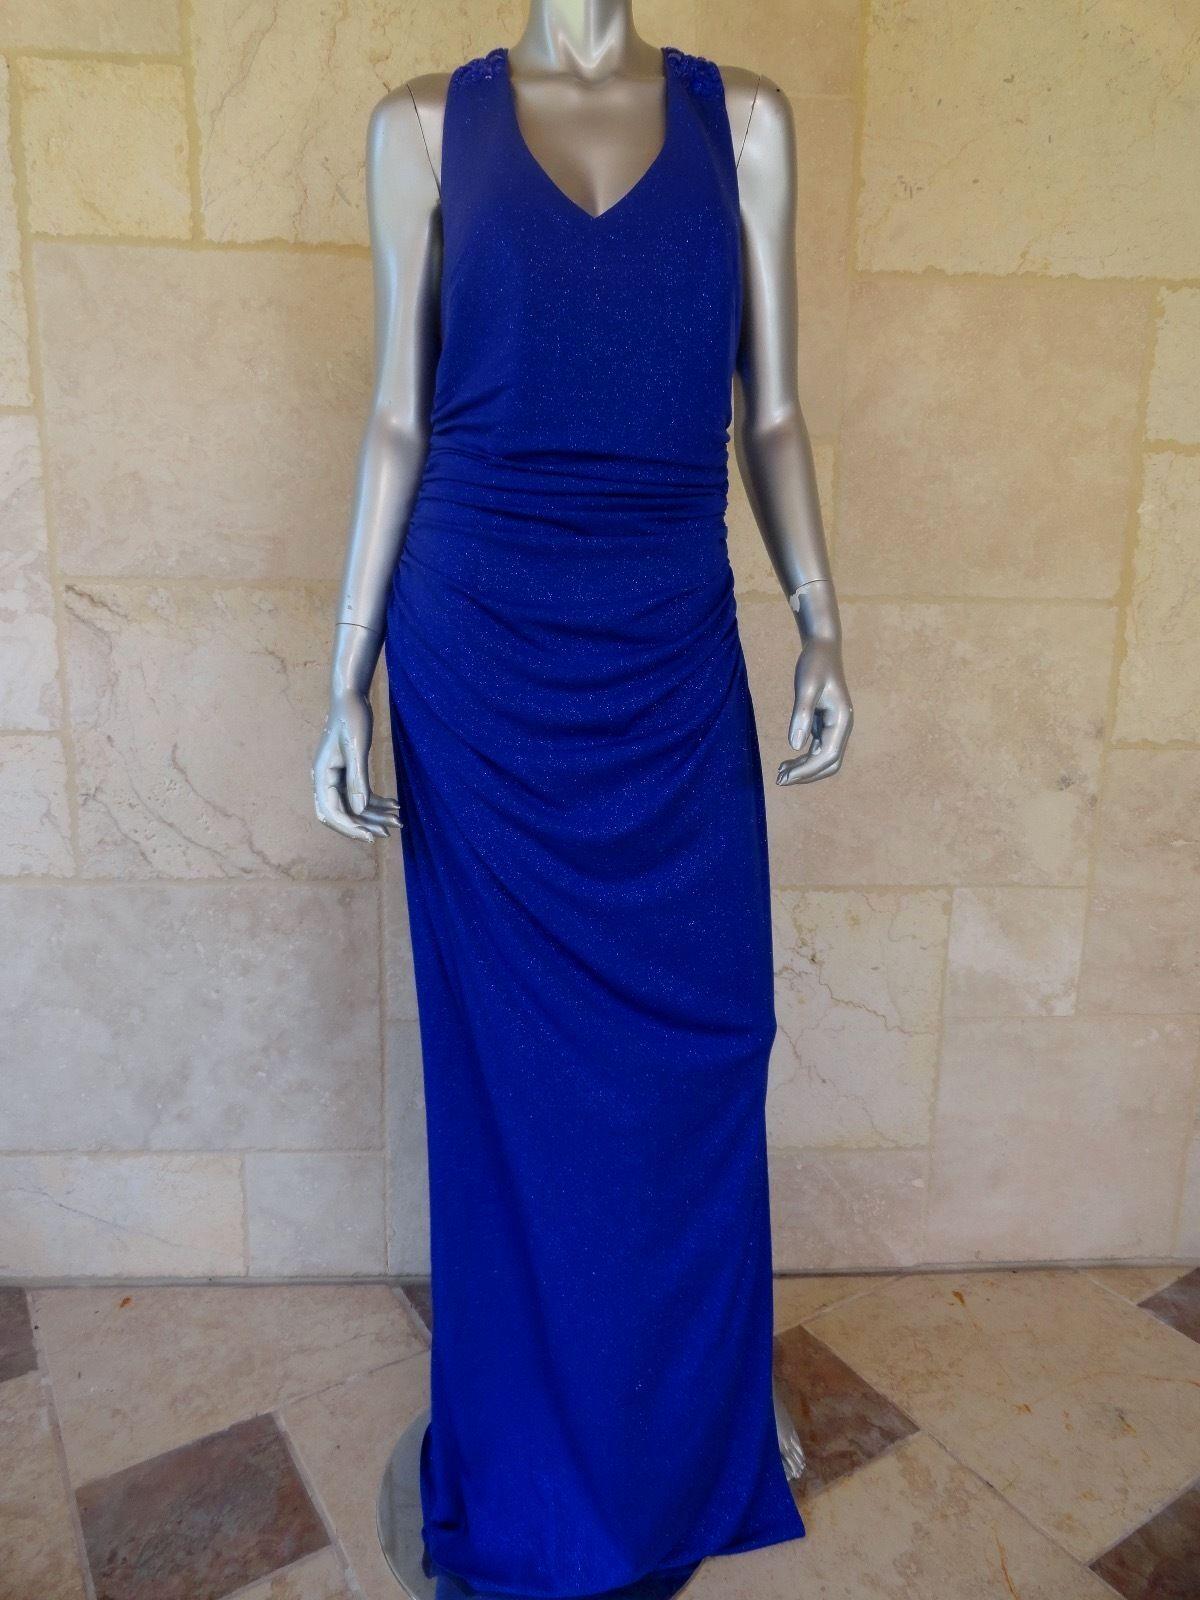 LAUNDRY BY SHELLI SEGAL Blau Glitter Open Back Prom Evening Dress Gown Sz12